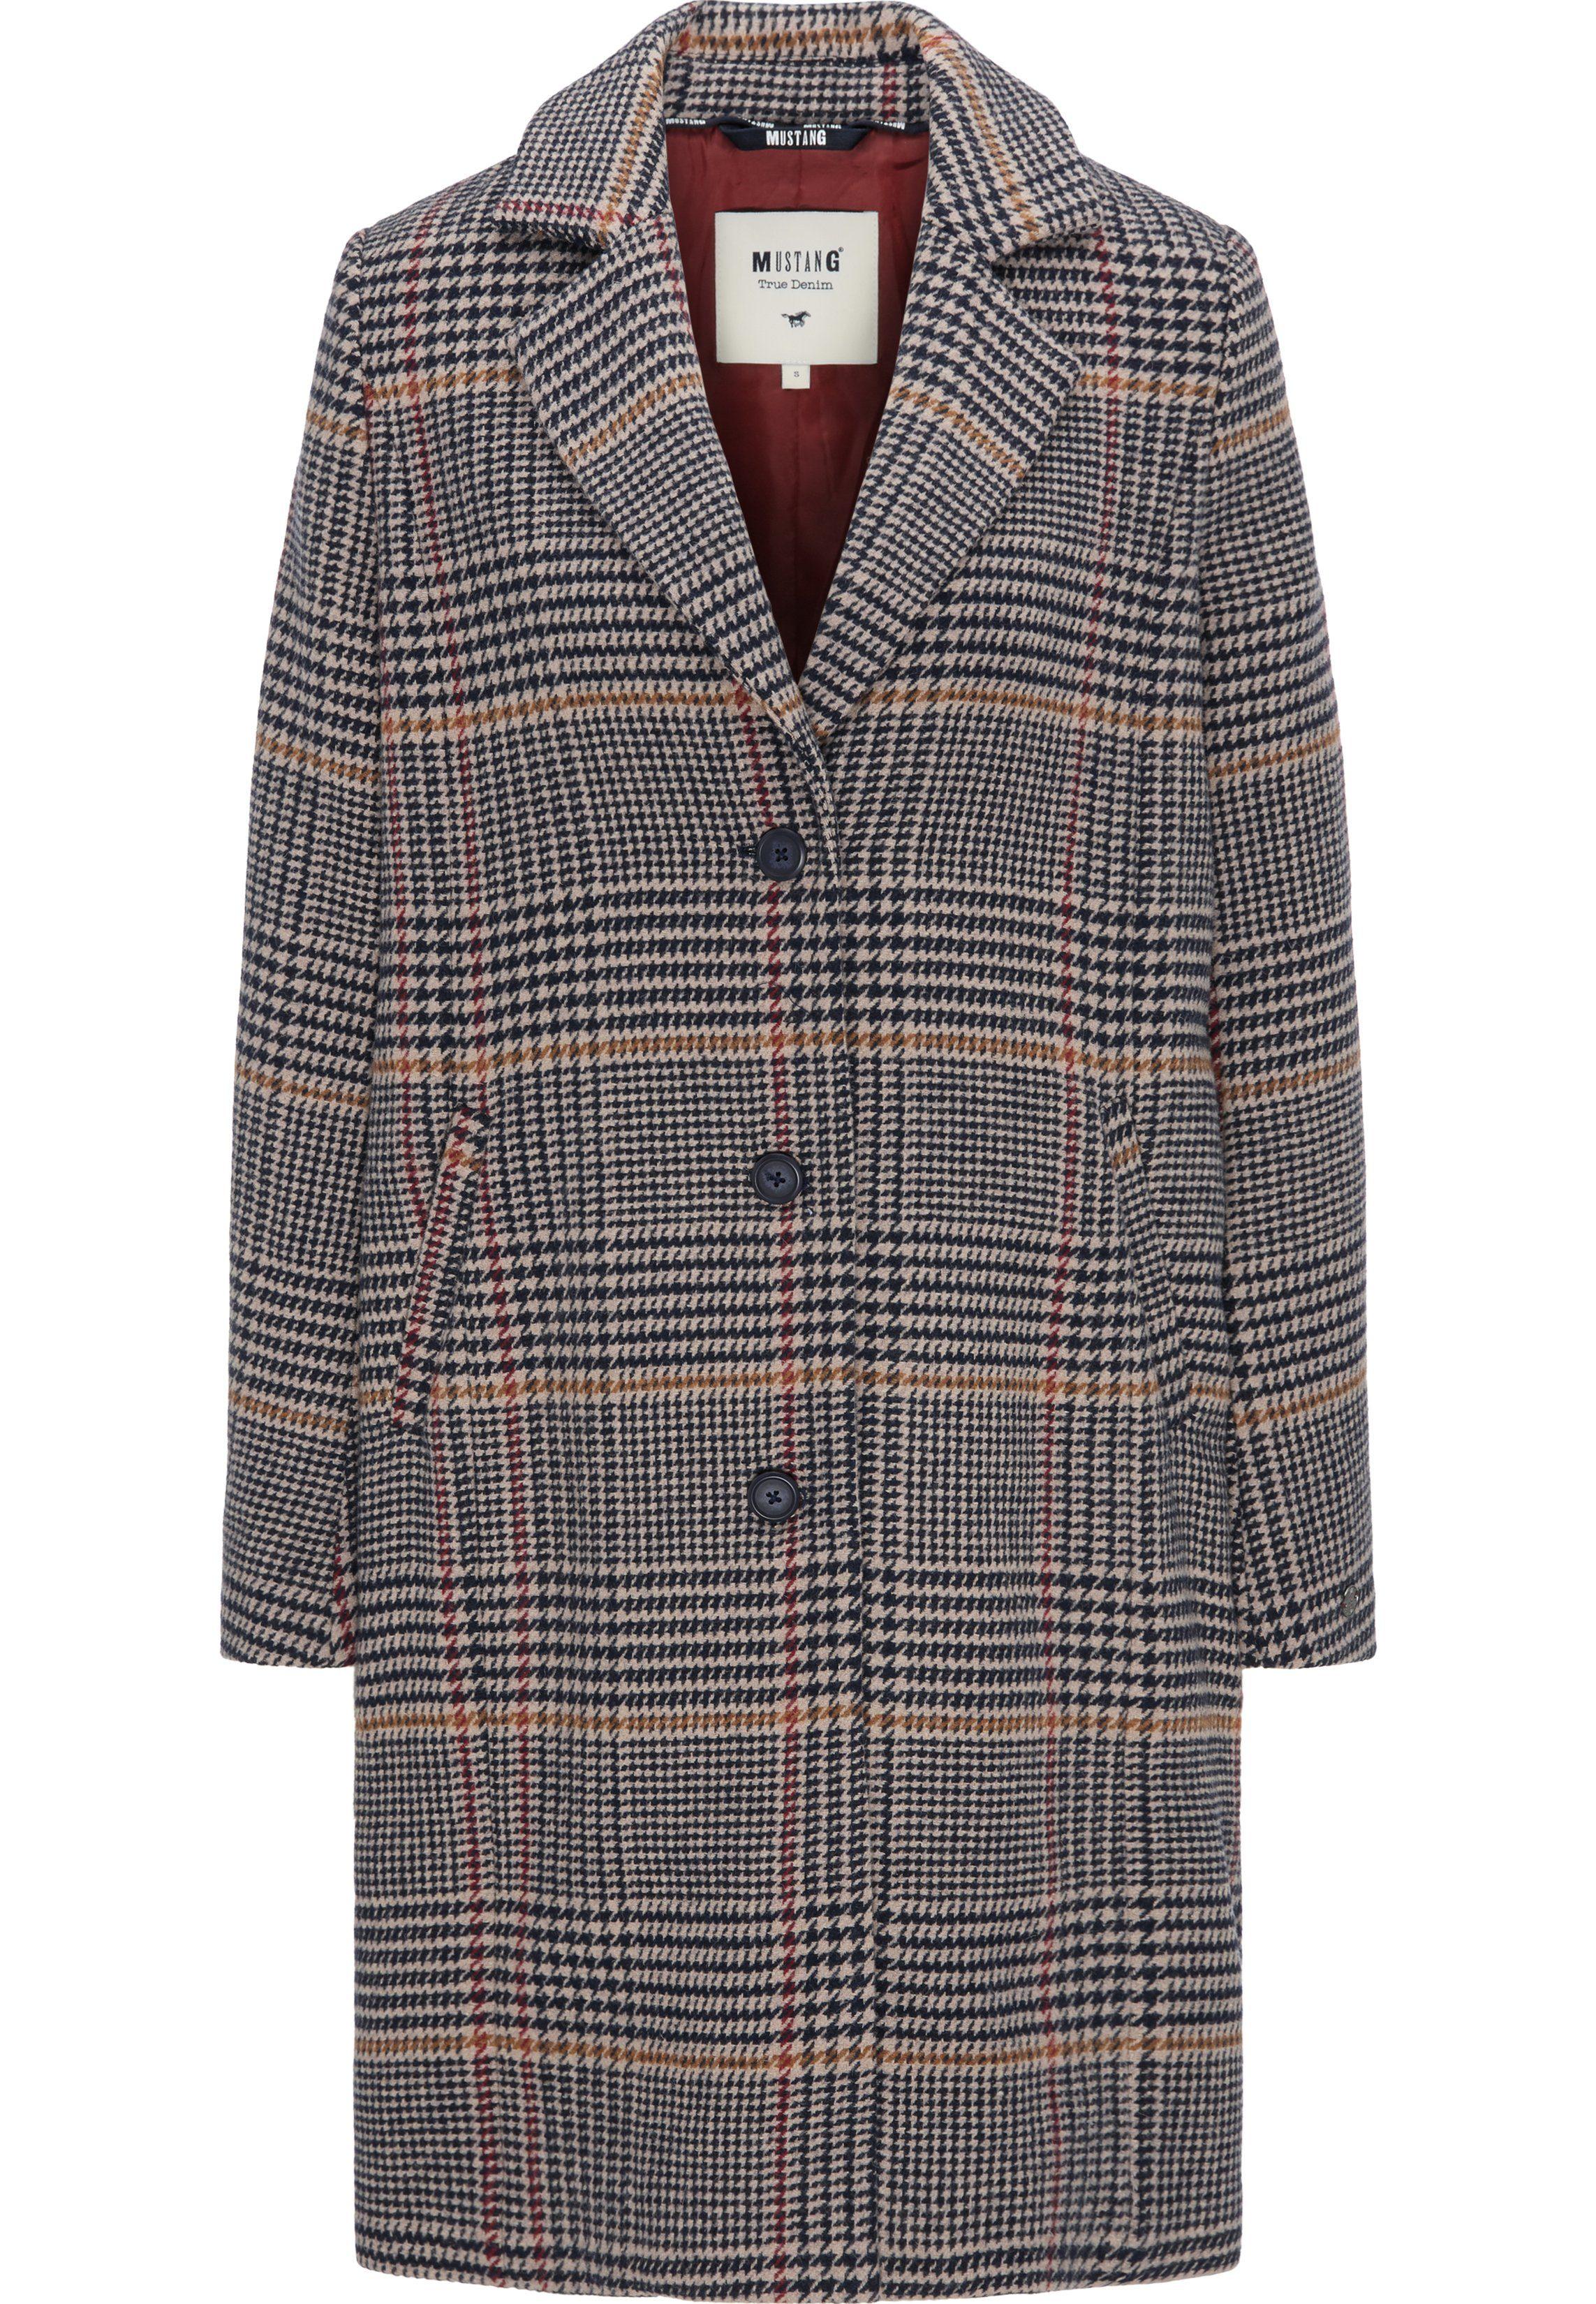 MUSTANG Jacke online kaufen | OTTO